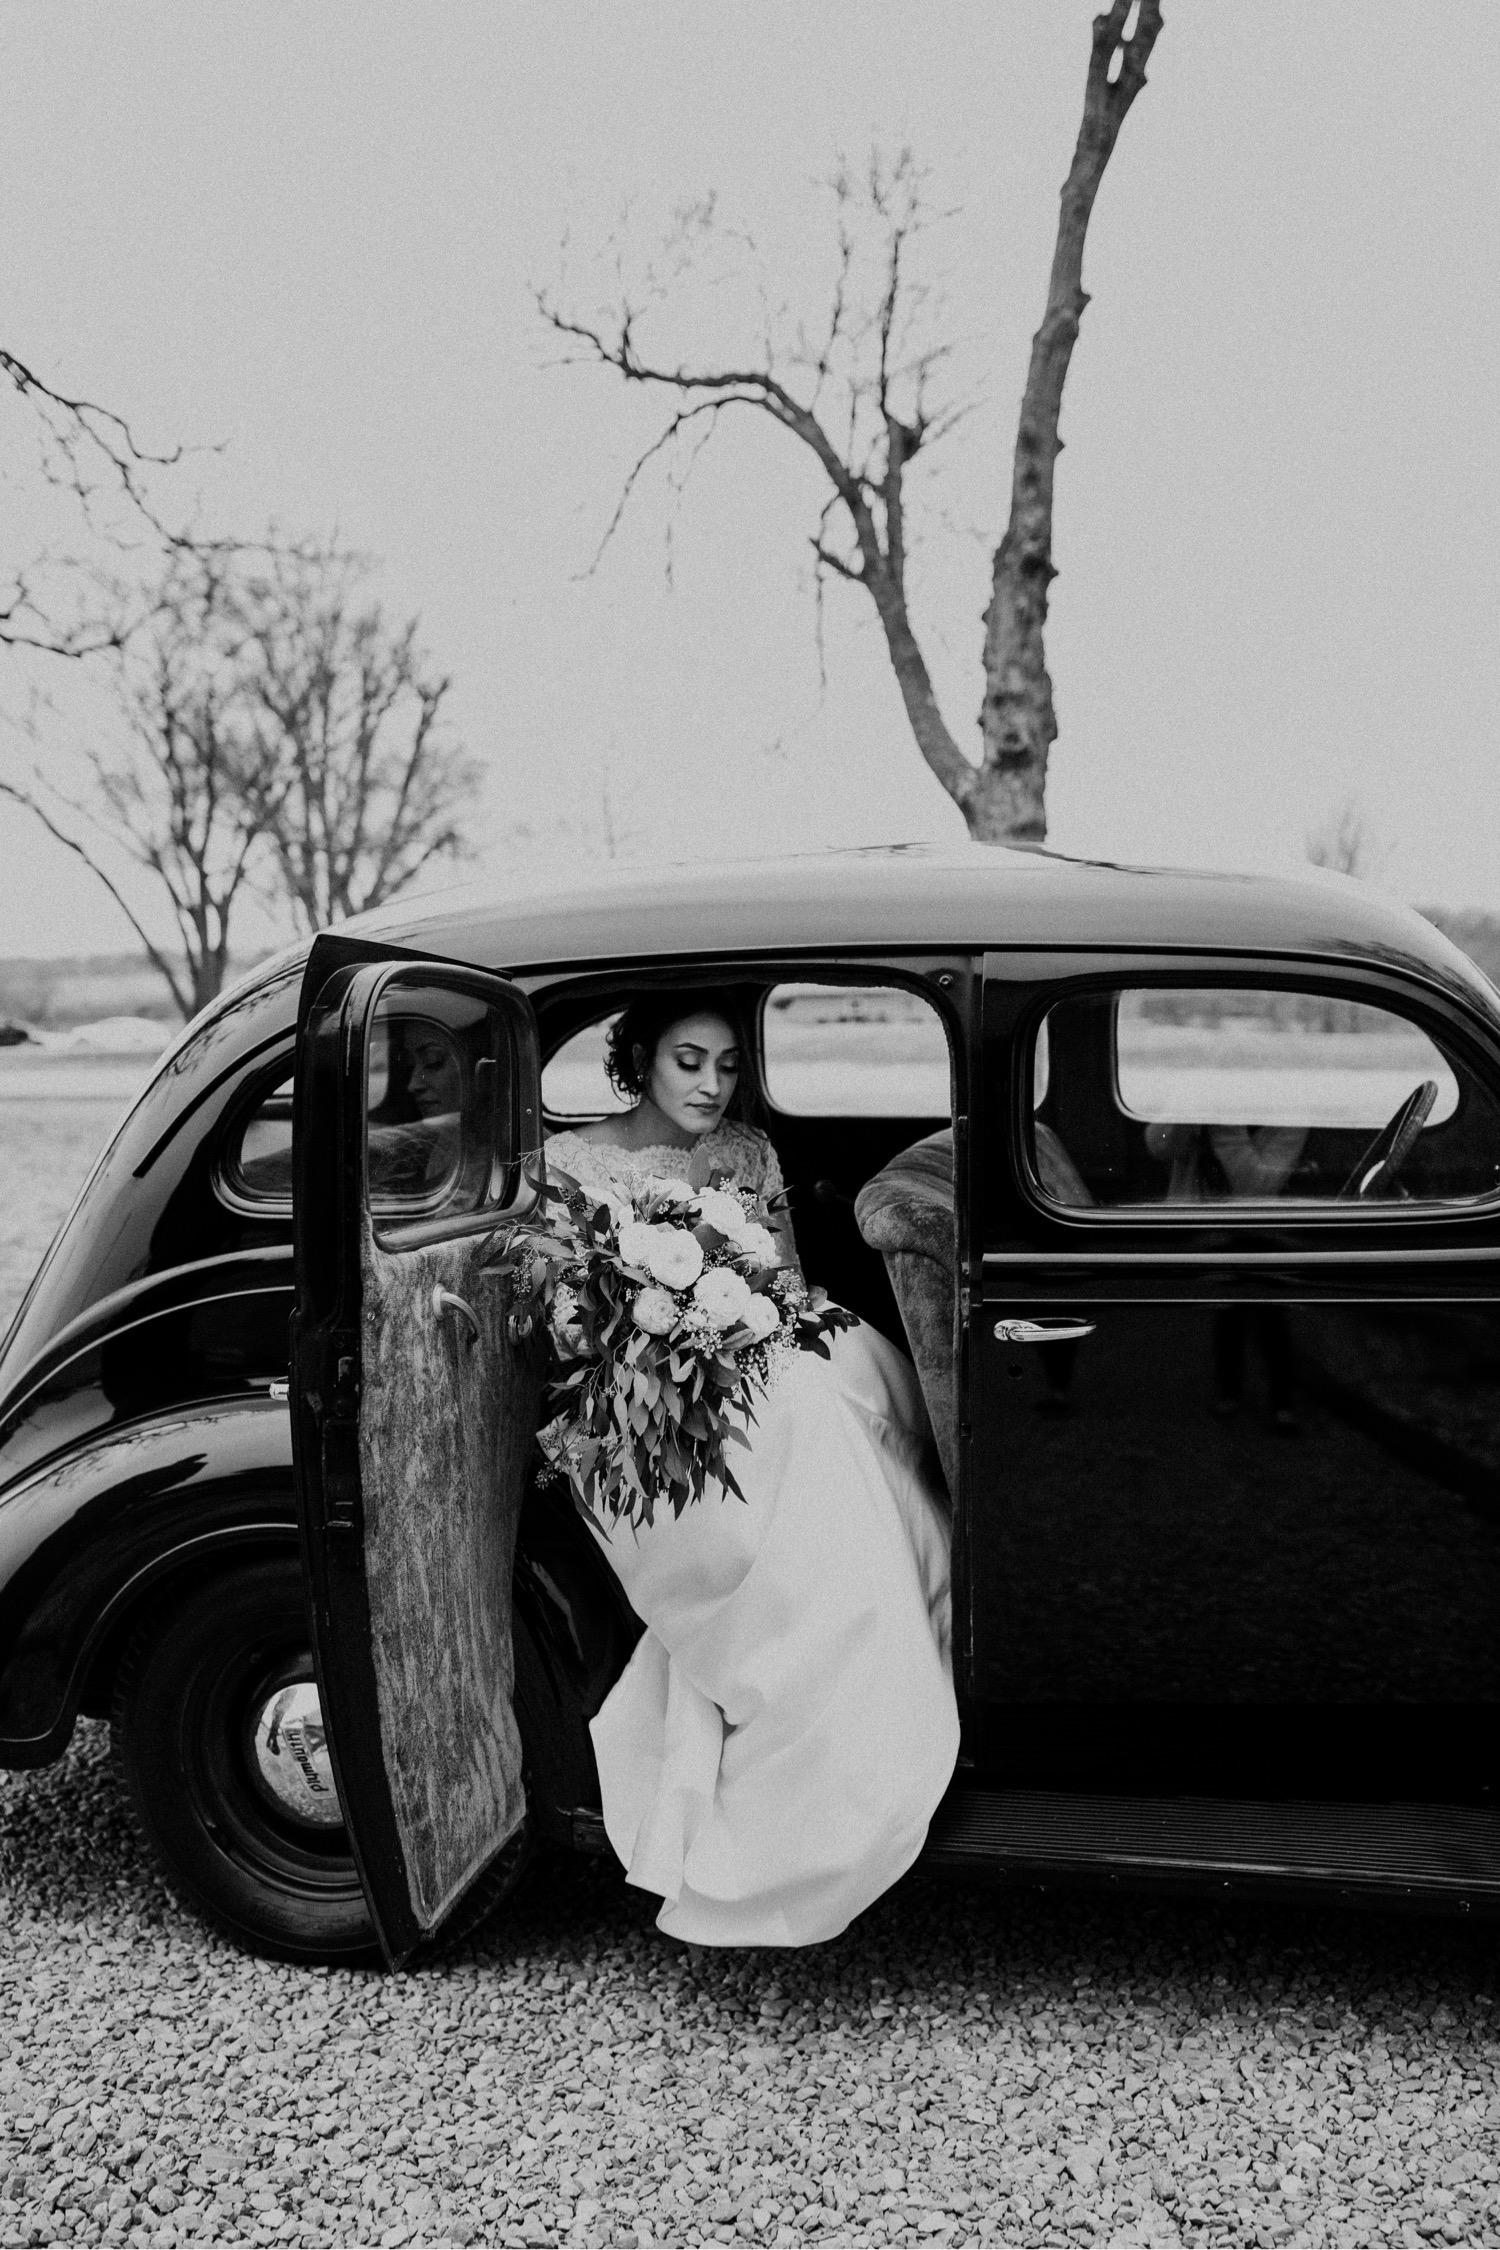 065_Hennings-834_Kansas_Kelsey_Missouri_Center_Wedding_Diane_Photography_Marshall_Jackson's_Event_City.jpg